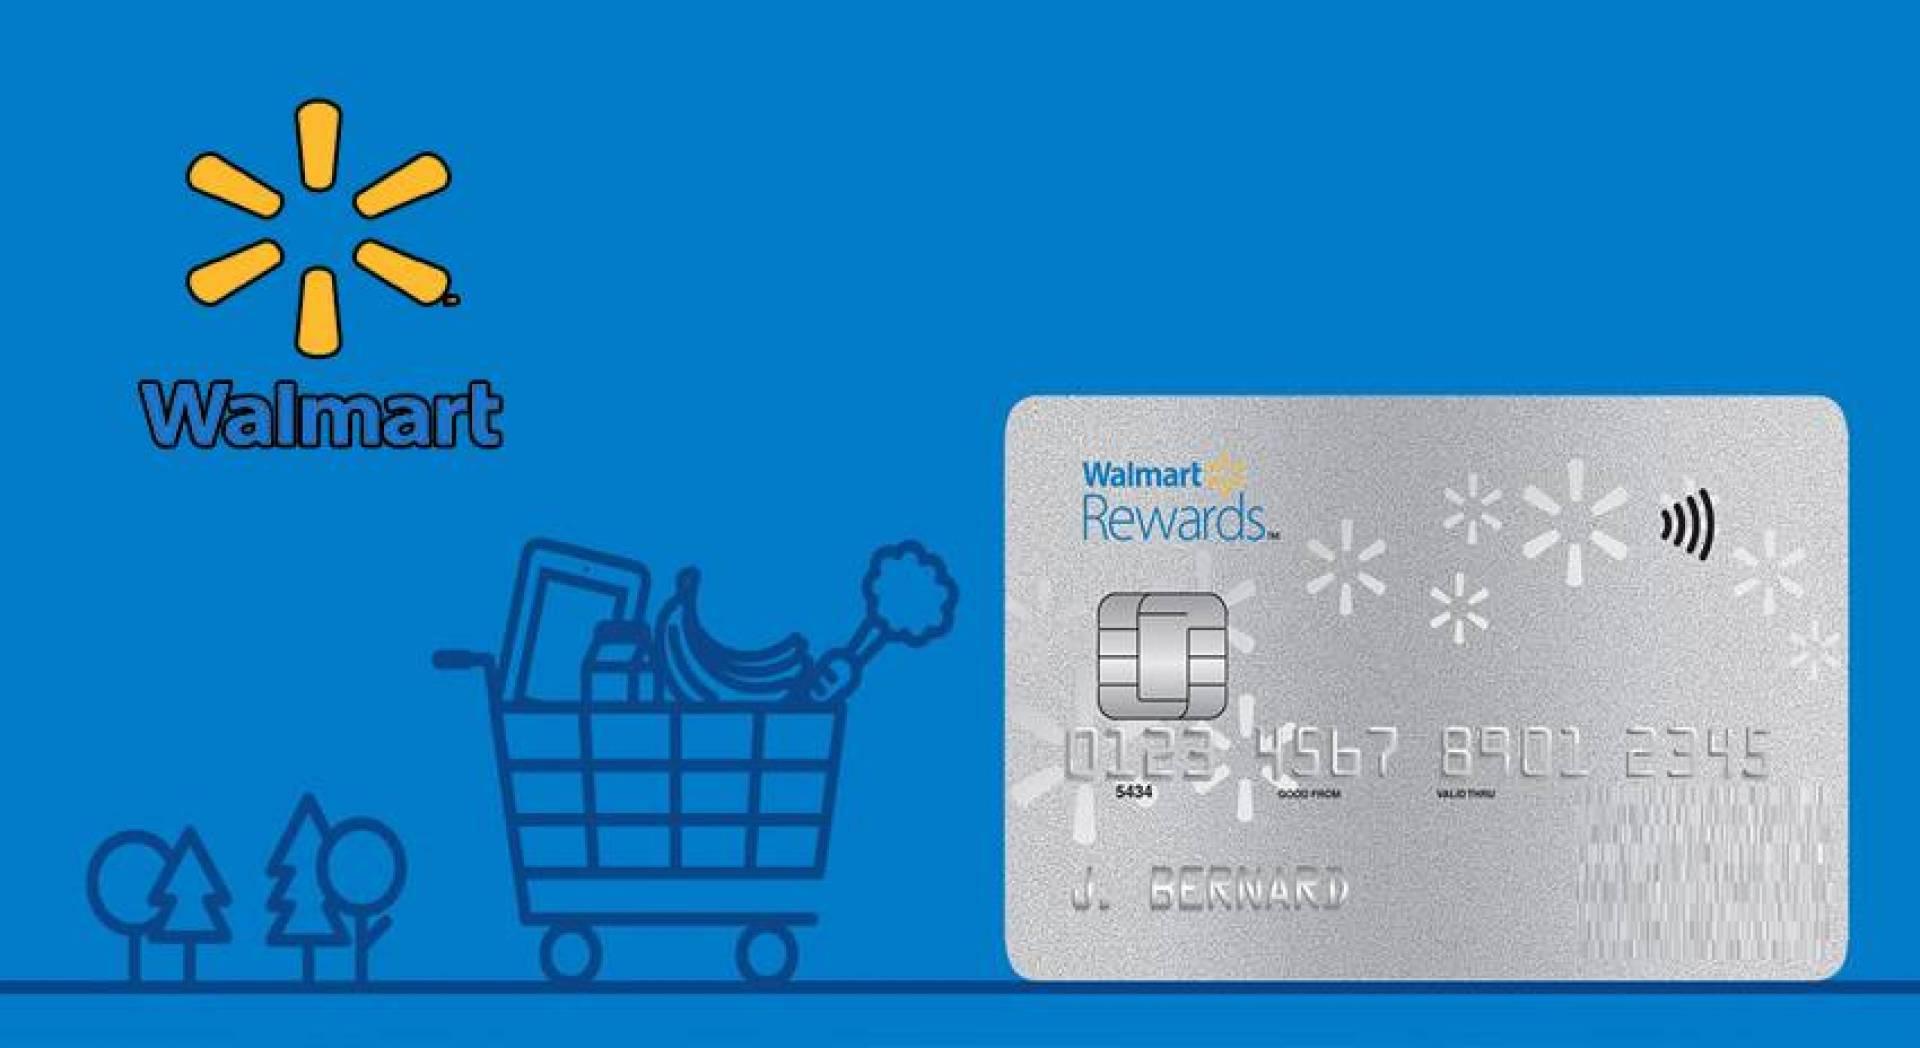 «Walmart» تطلق بطاقتي ائتمان جديدتين لعملائها